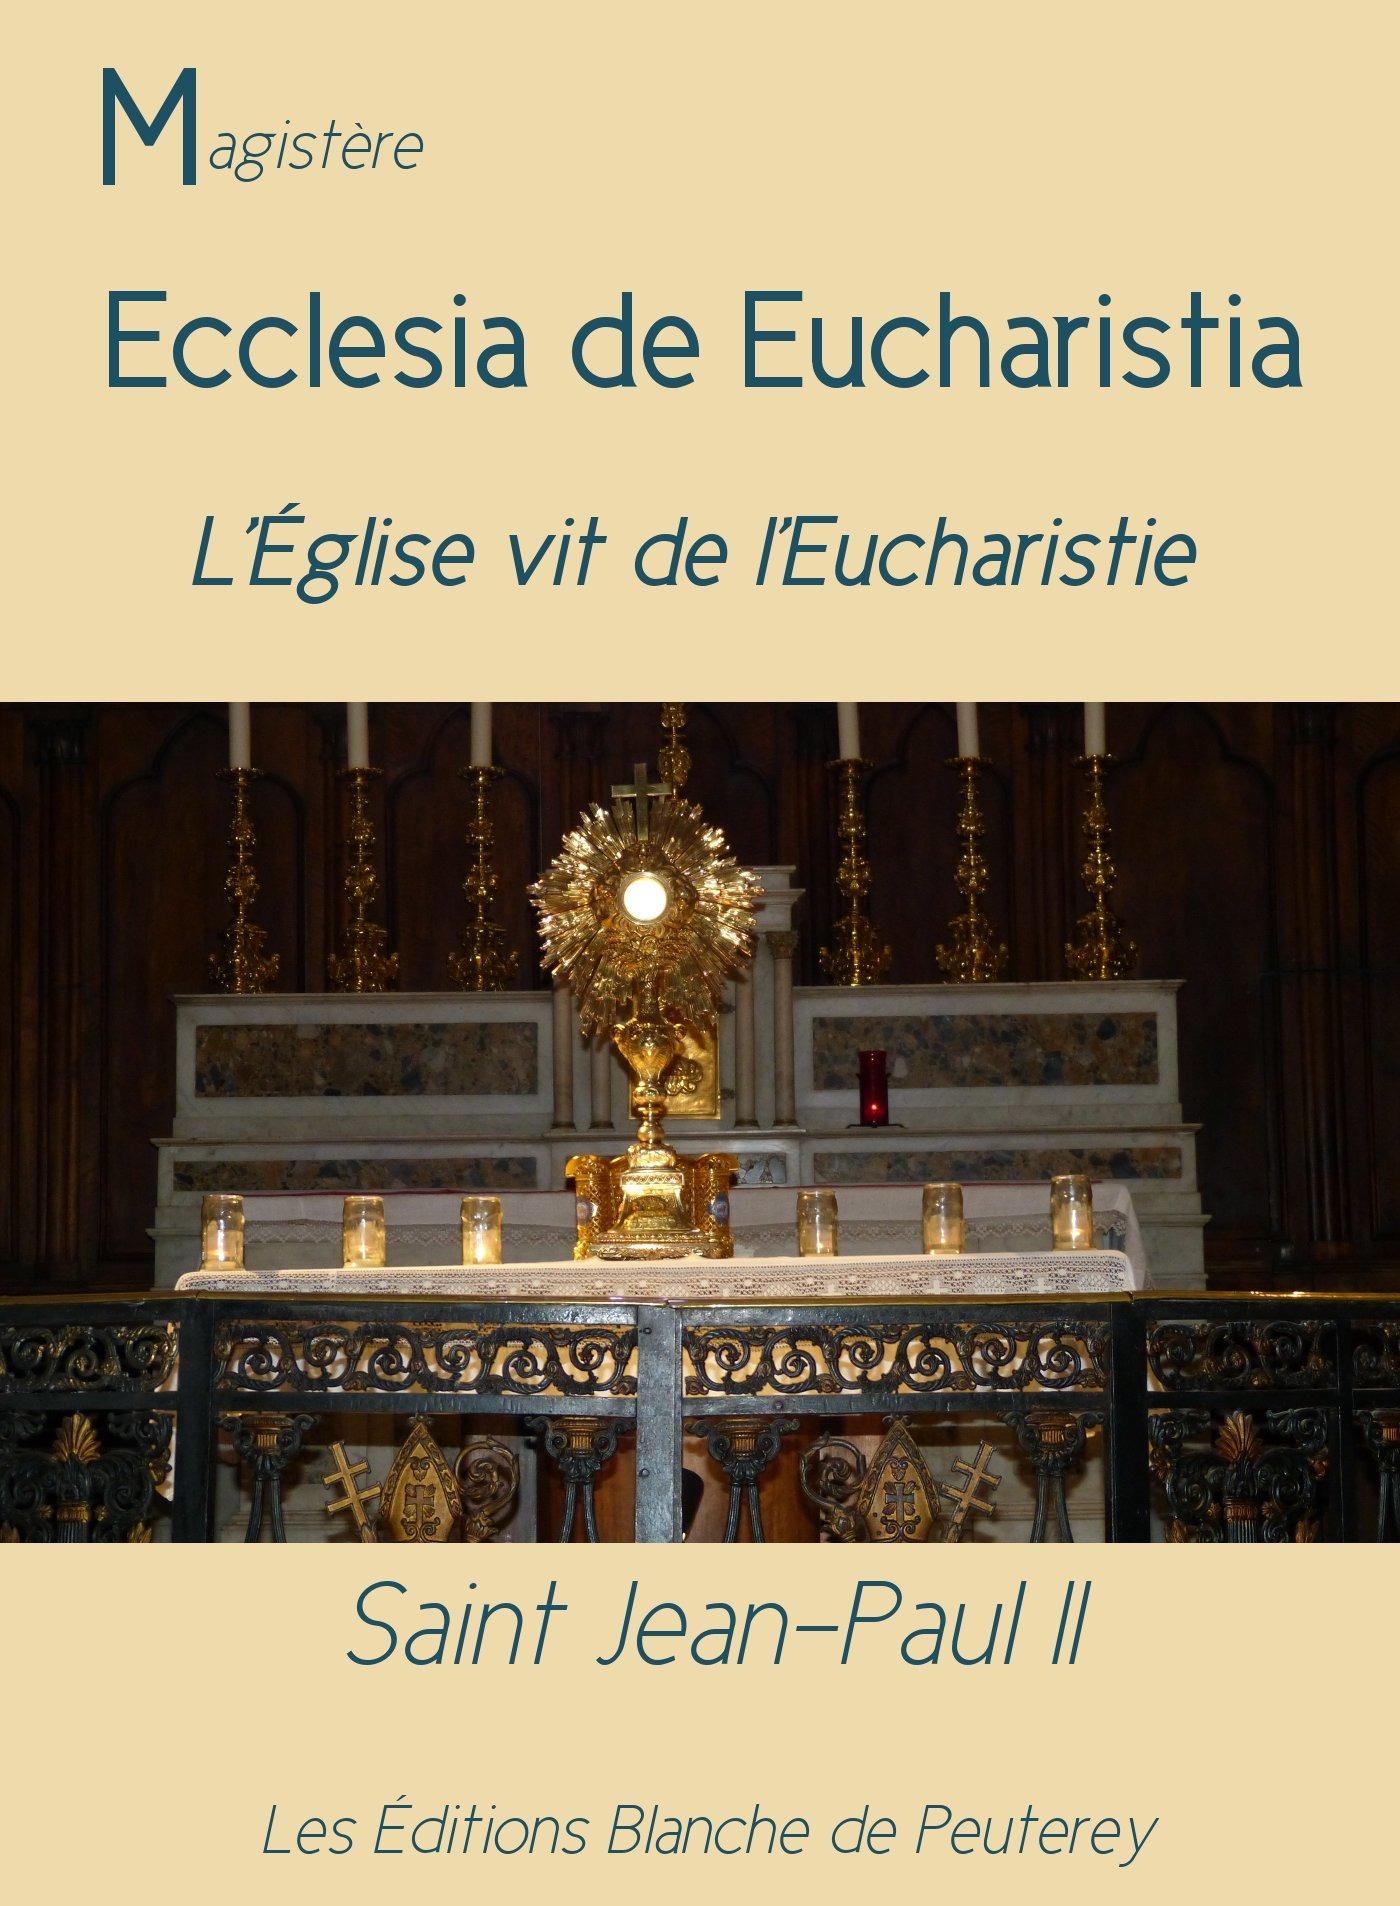 Ecclesia de Eucharistia, L'EGLISE VIT DE L'EUCHARISTIE